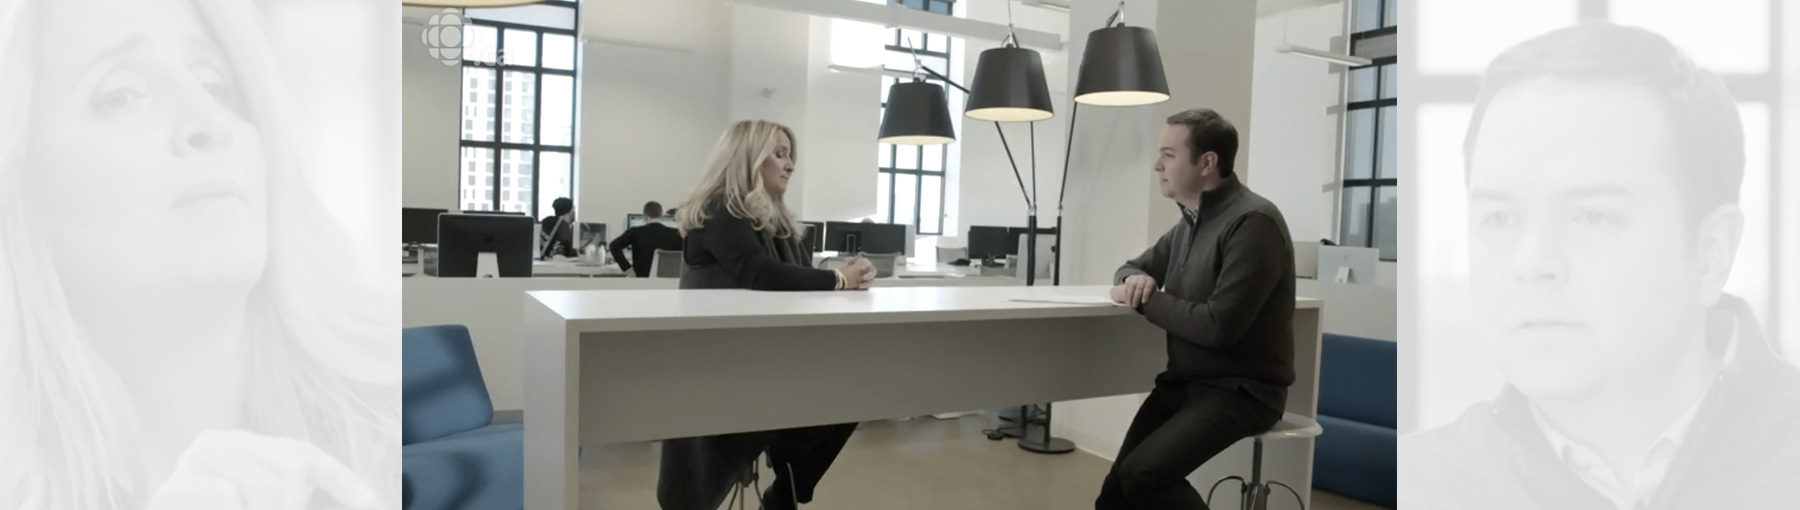 interview-1800x510.jpg